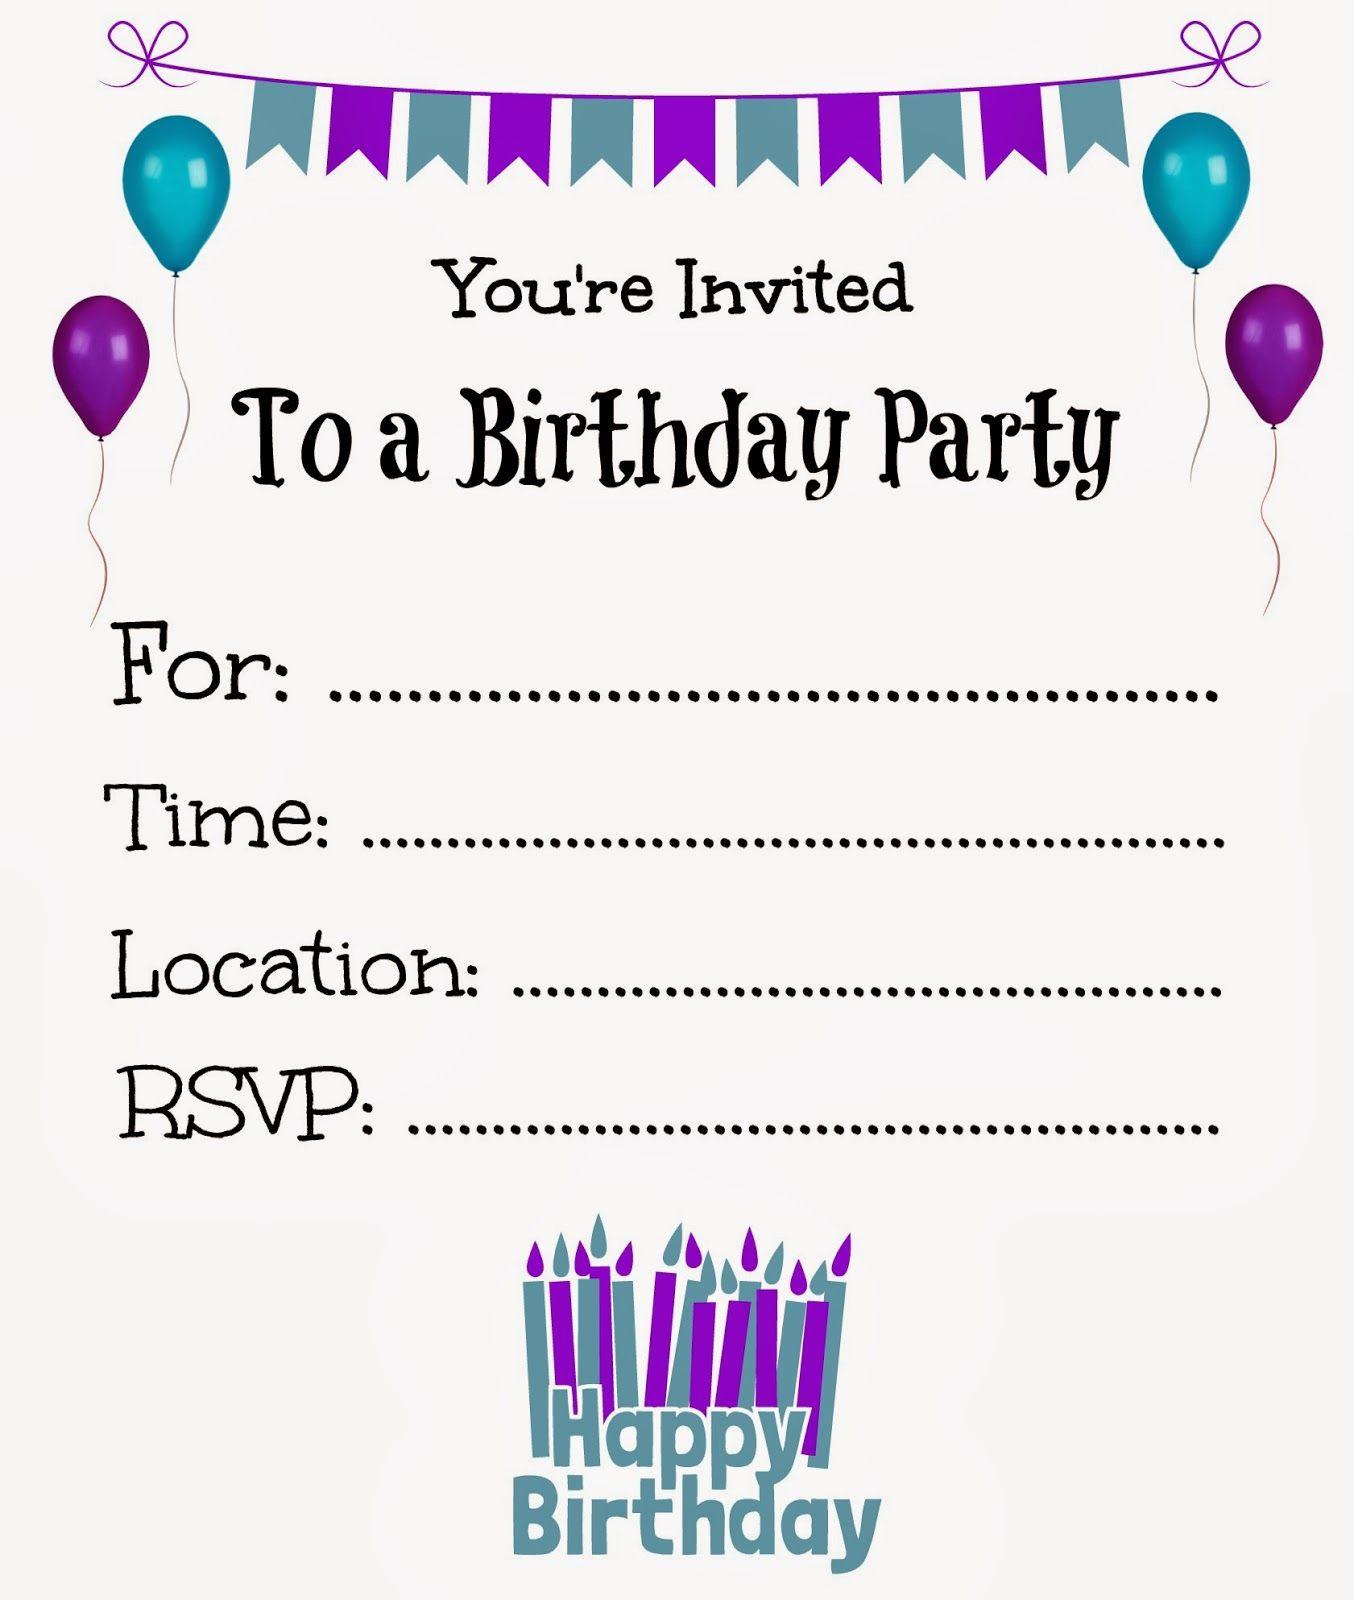 Free Printable Birthday Invitations For Kids #freeprintables - Free Printable Birthday Invitation Templates